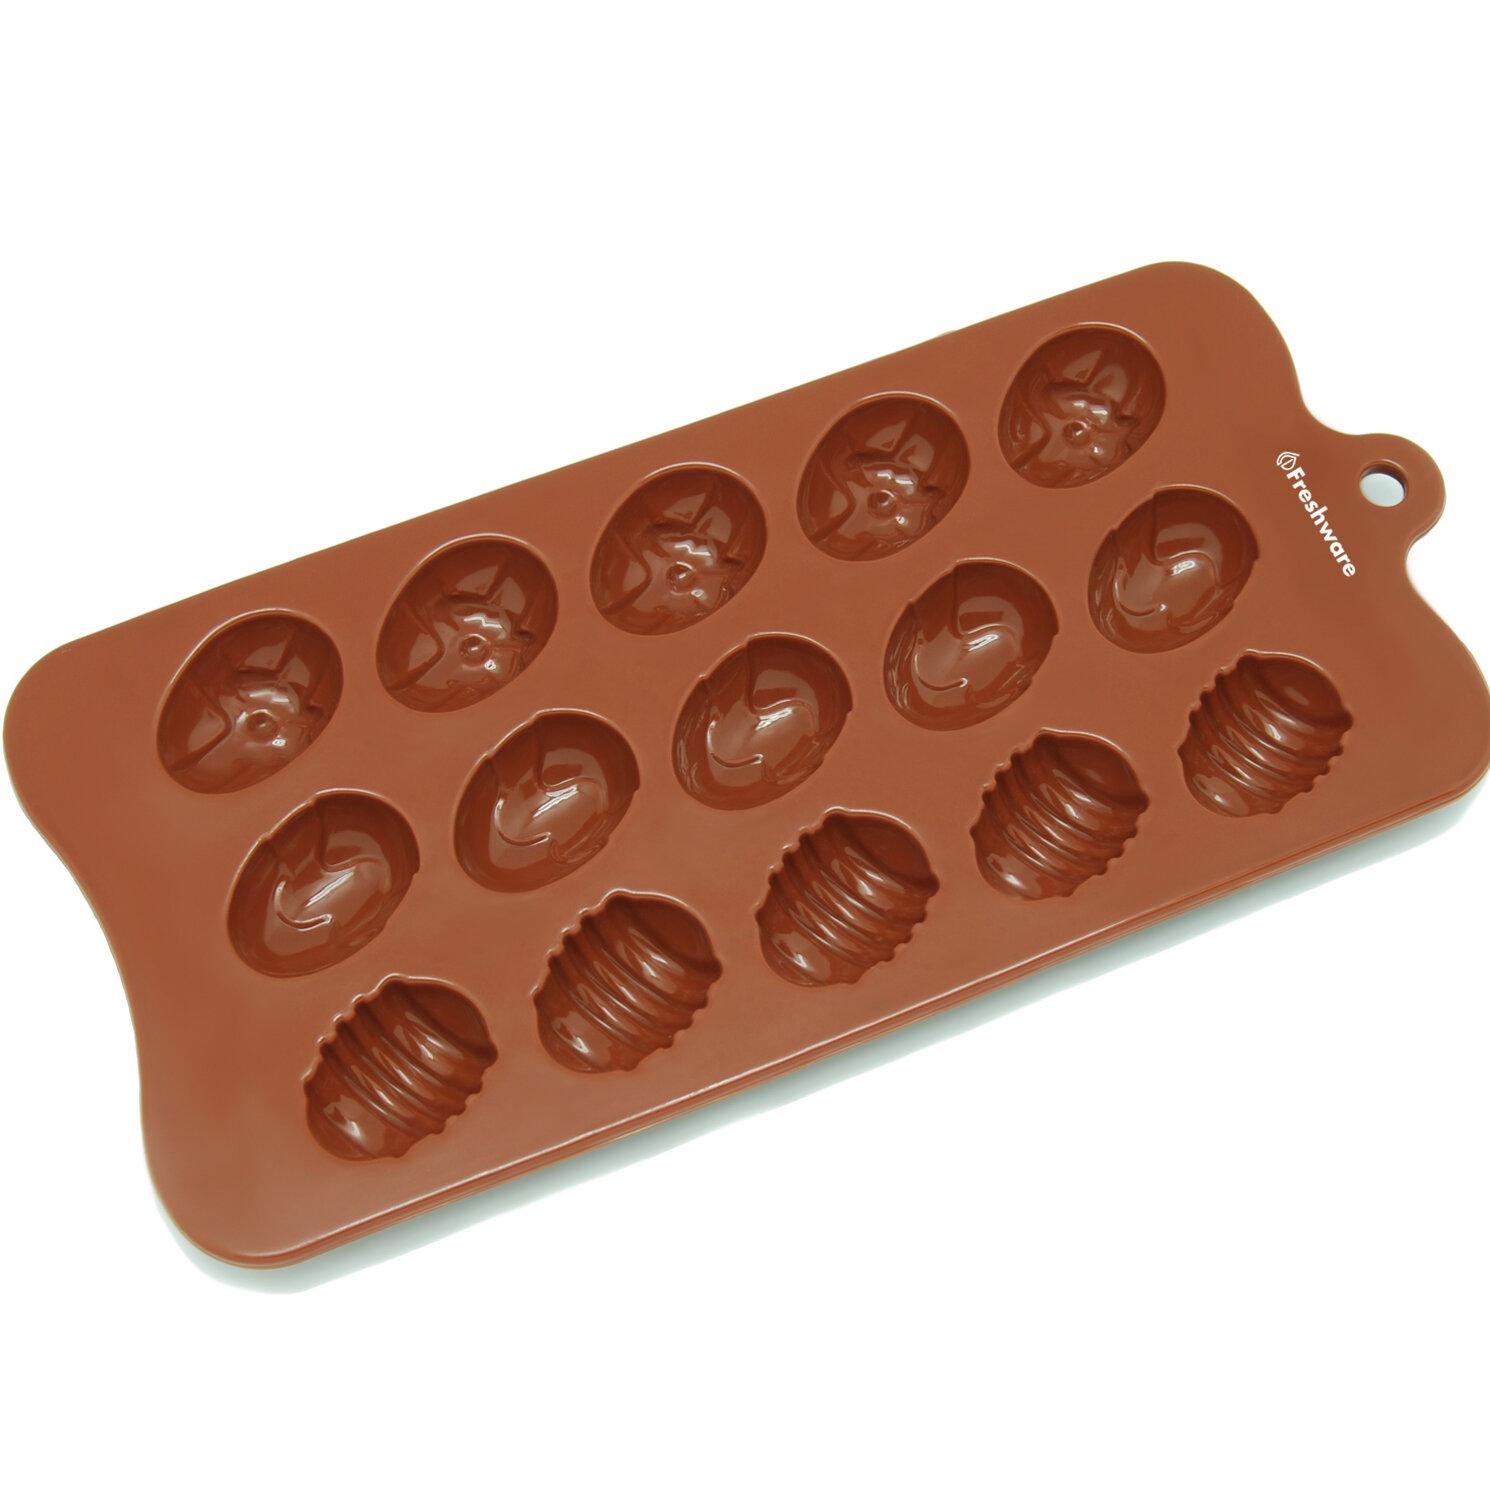 Freshware 15 Cavity Silicone Mold Pan Wayfair